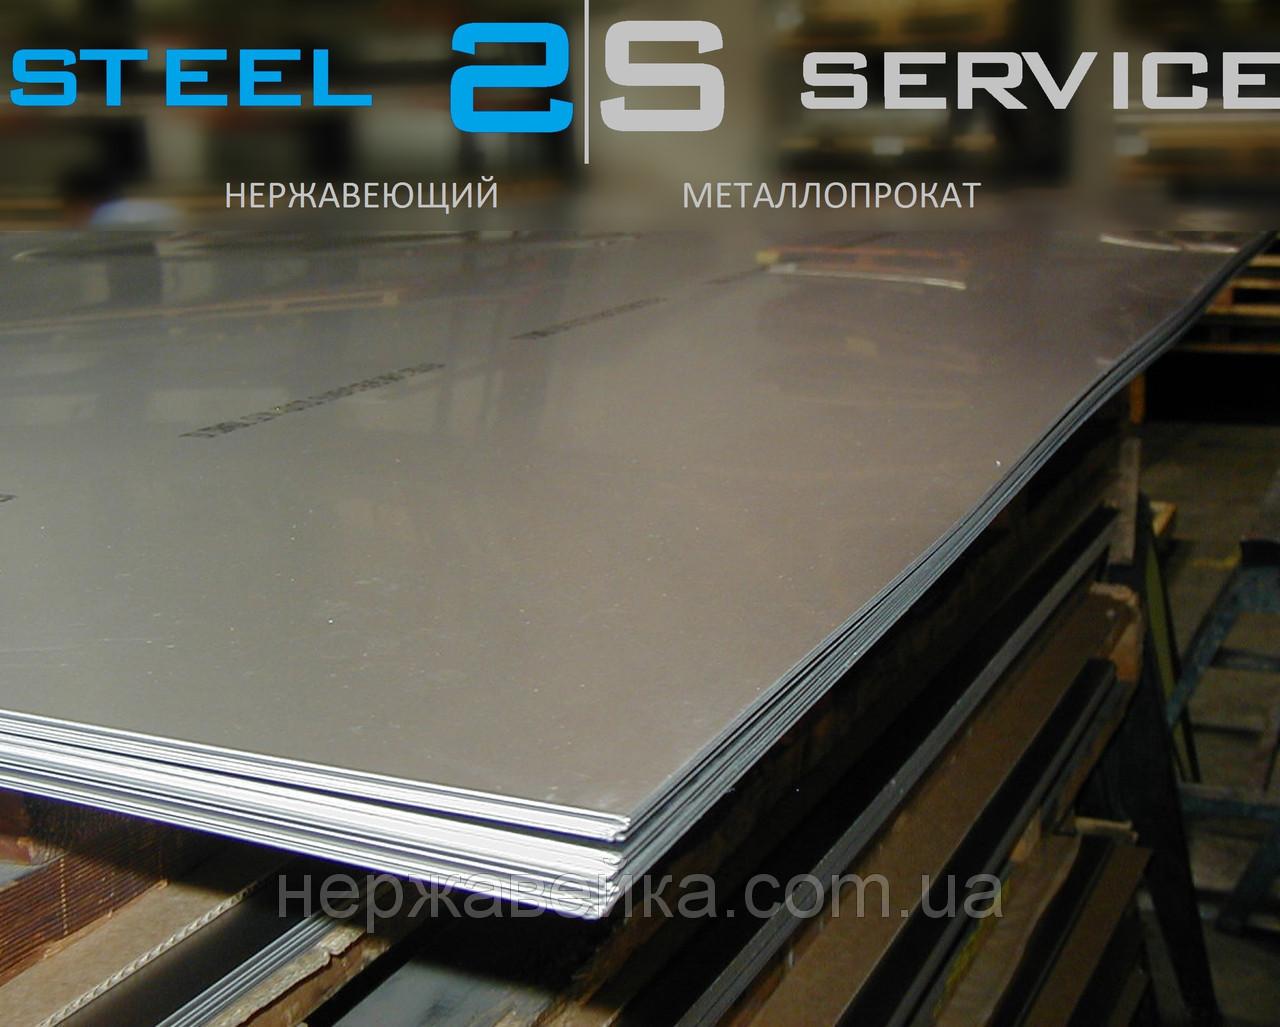 Листовая нержавейка 0,5х1000х2000мм AISI 430(12Х17) 2B - матовый, технический